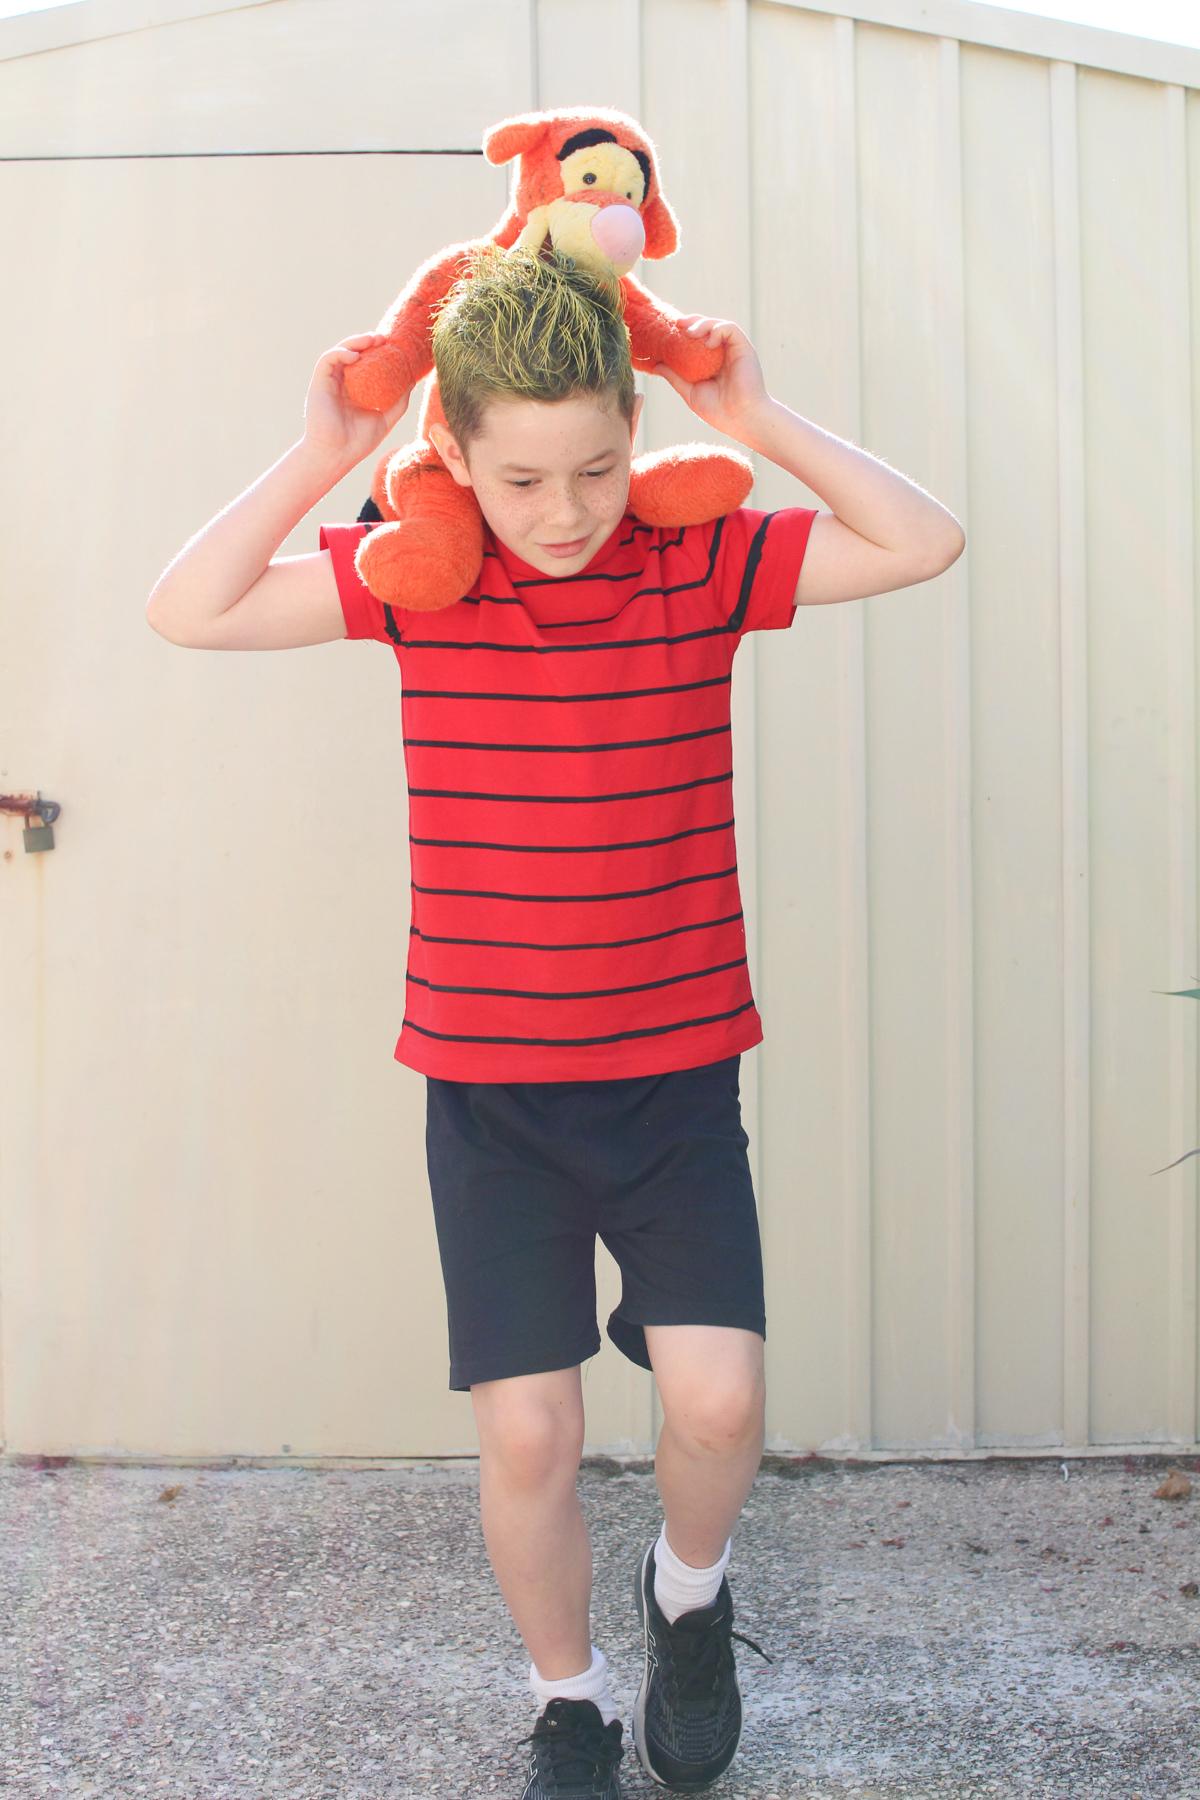 Easy Calvin and Hobbes DIY costume for Book Week or Halloween